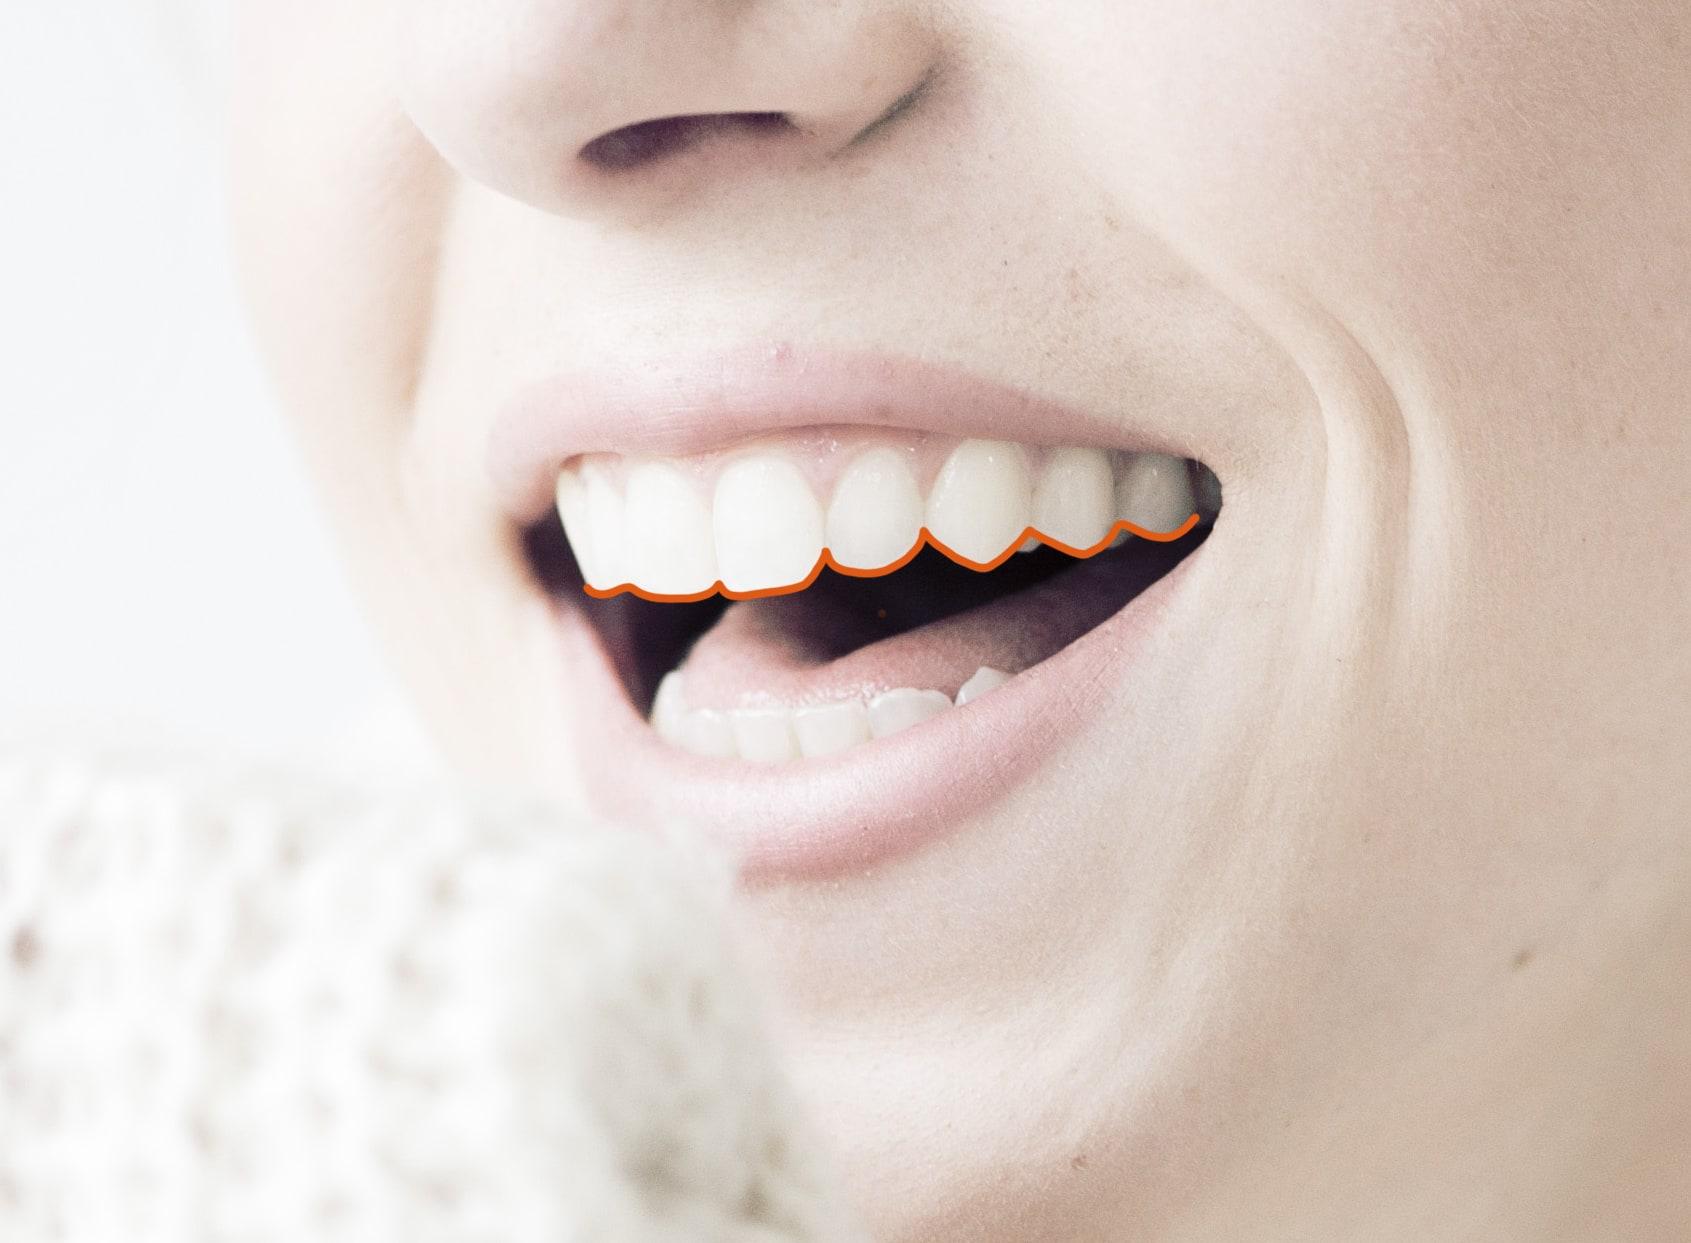 Recontorneado dental